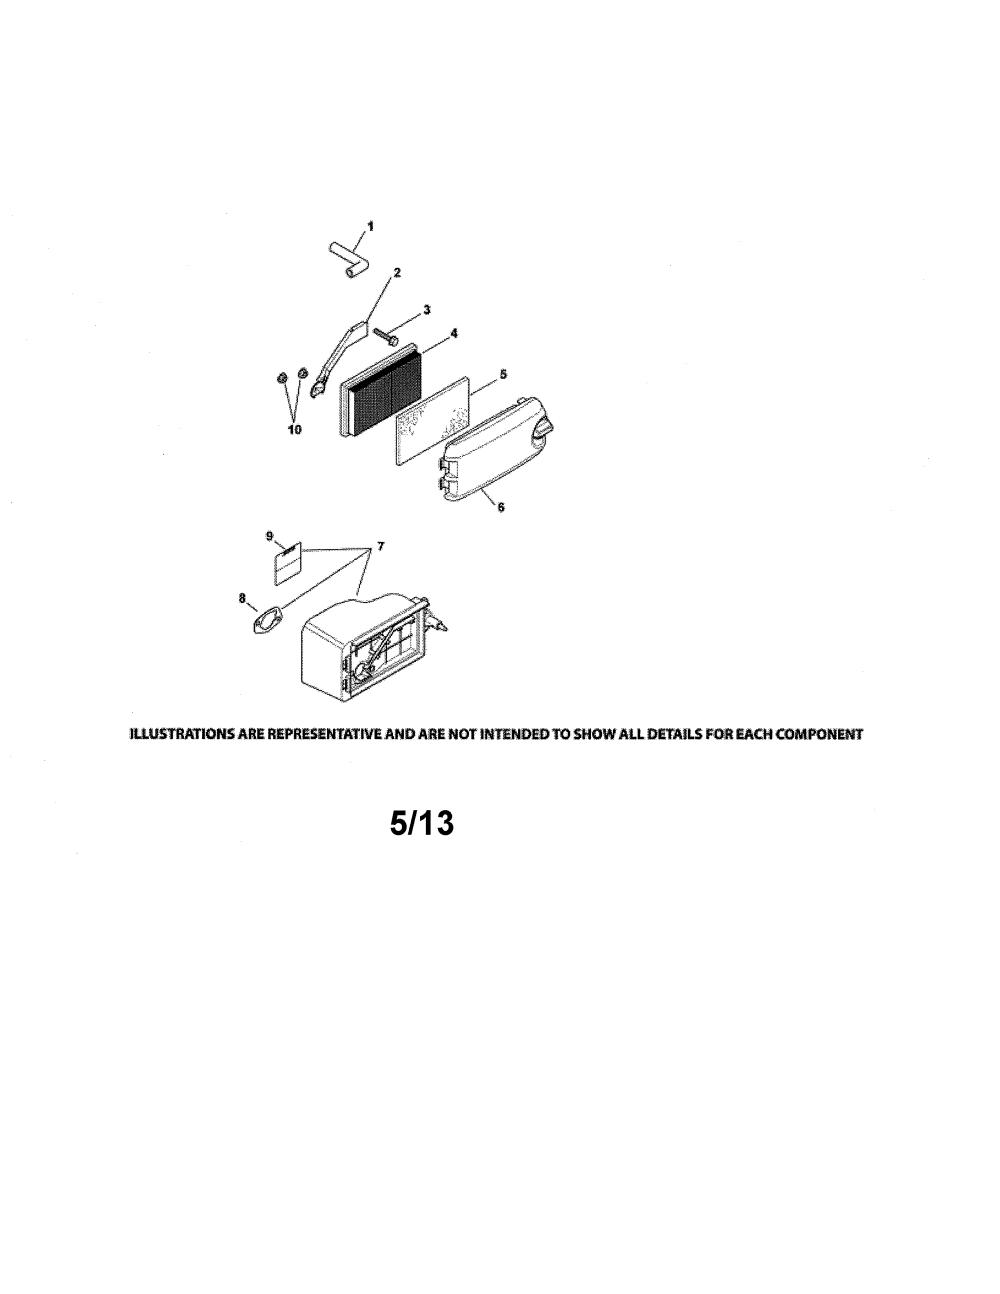 medium resolution of kohler ph xt675 2044 air intake diagram